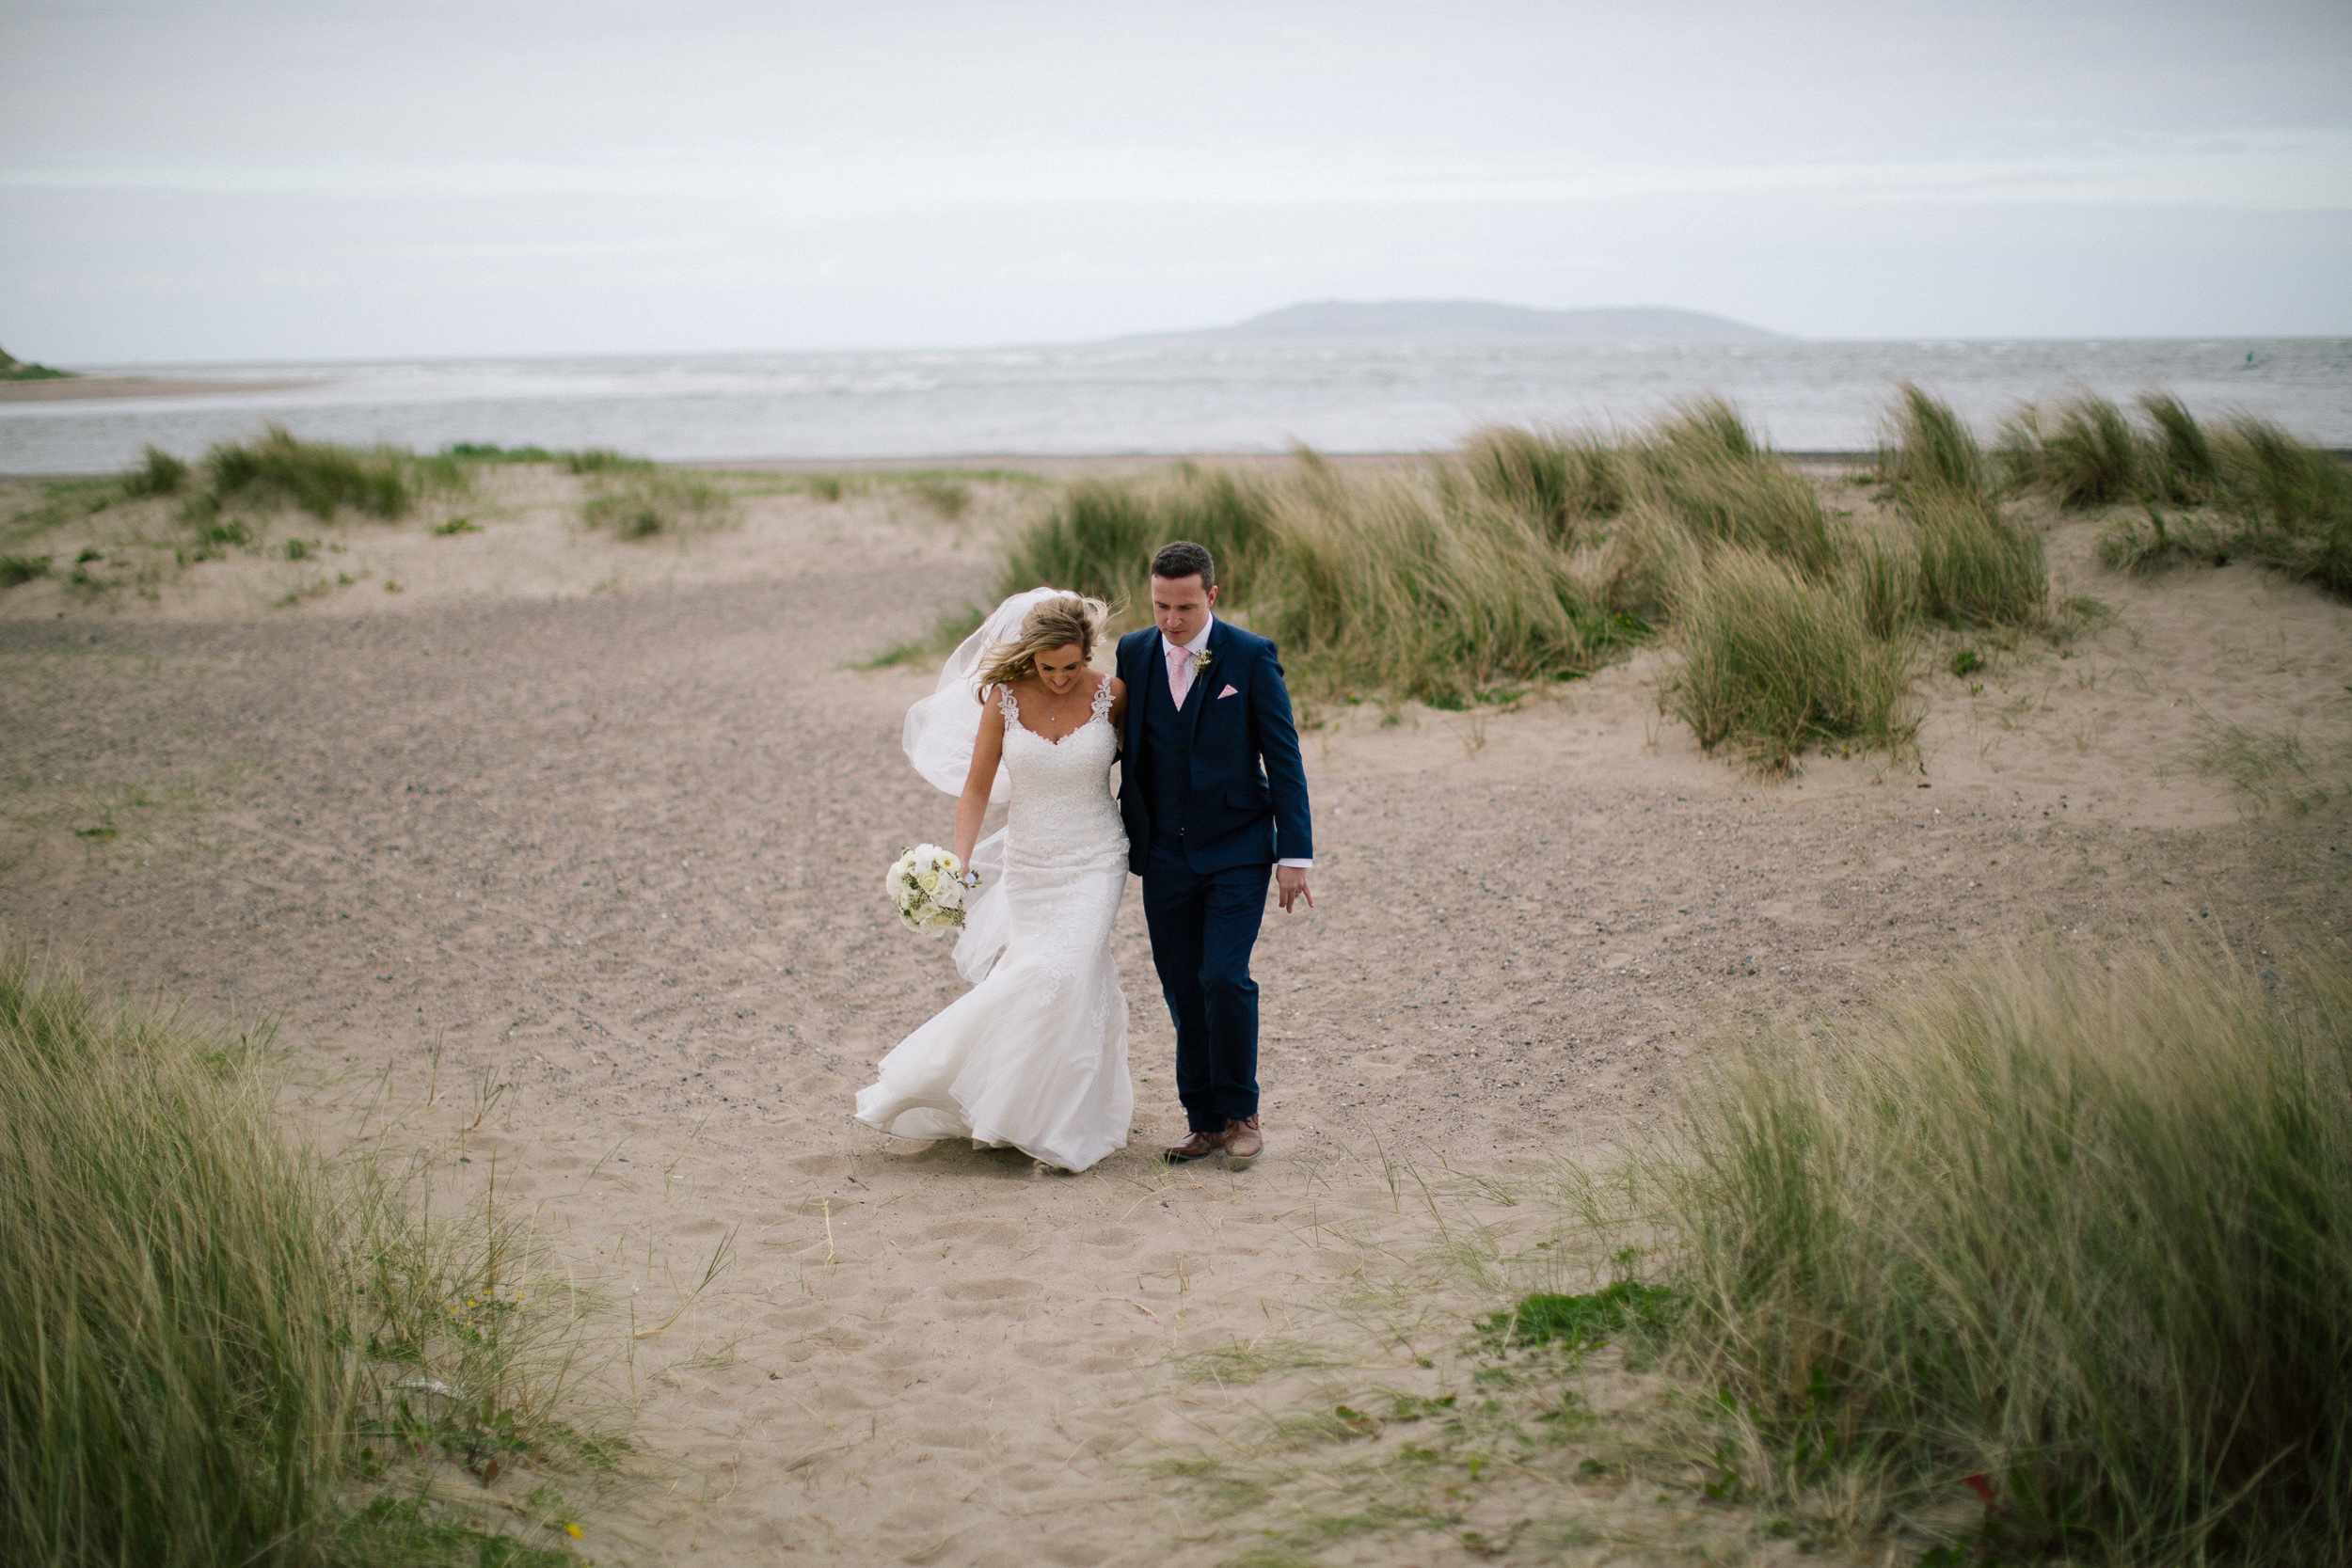 Clairebyrnephotography-malahide-beach-grace-pa-15.jpg